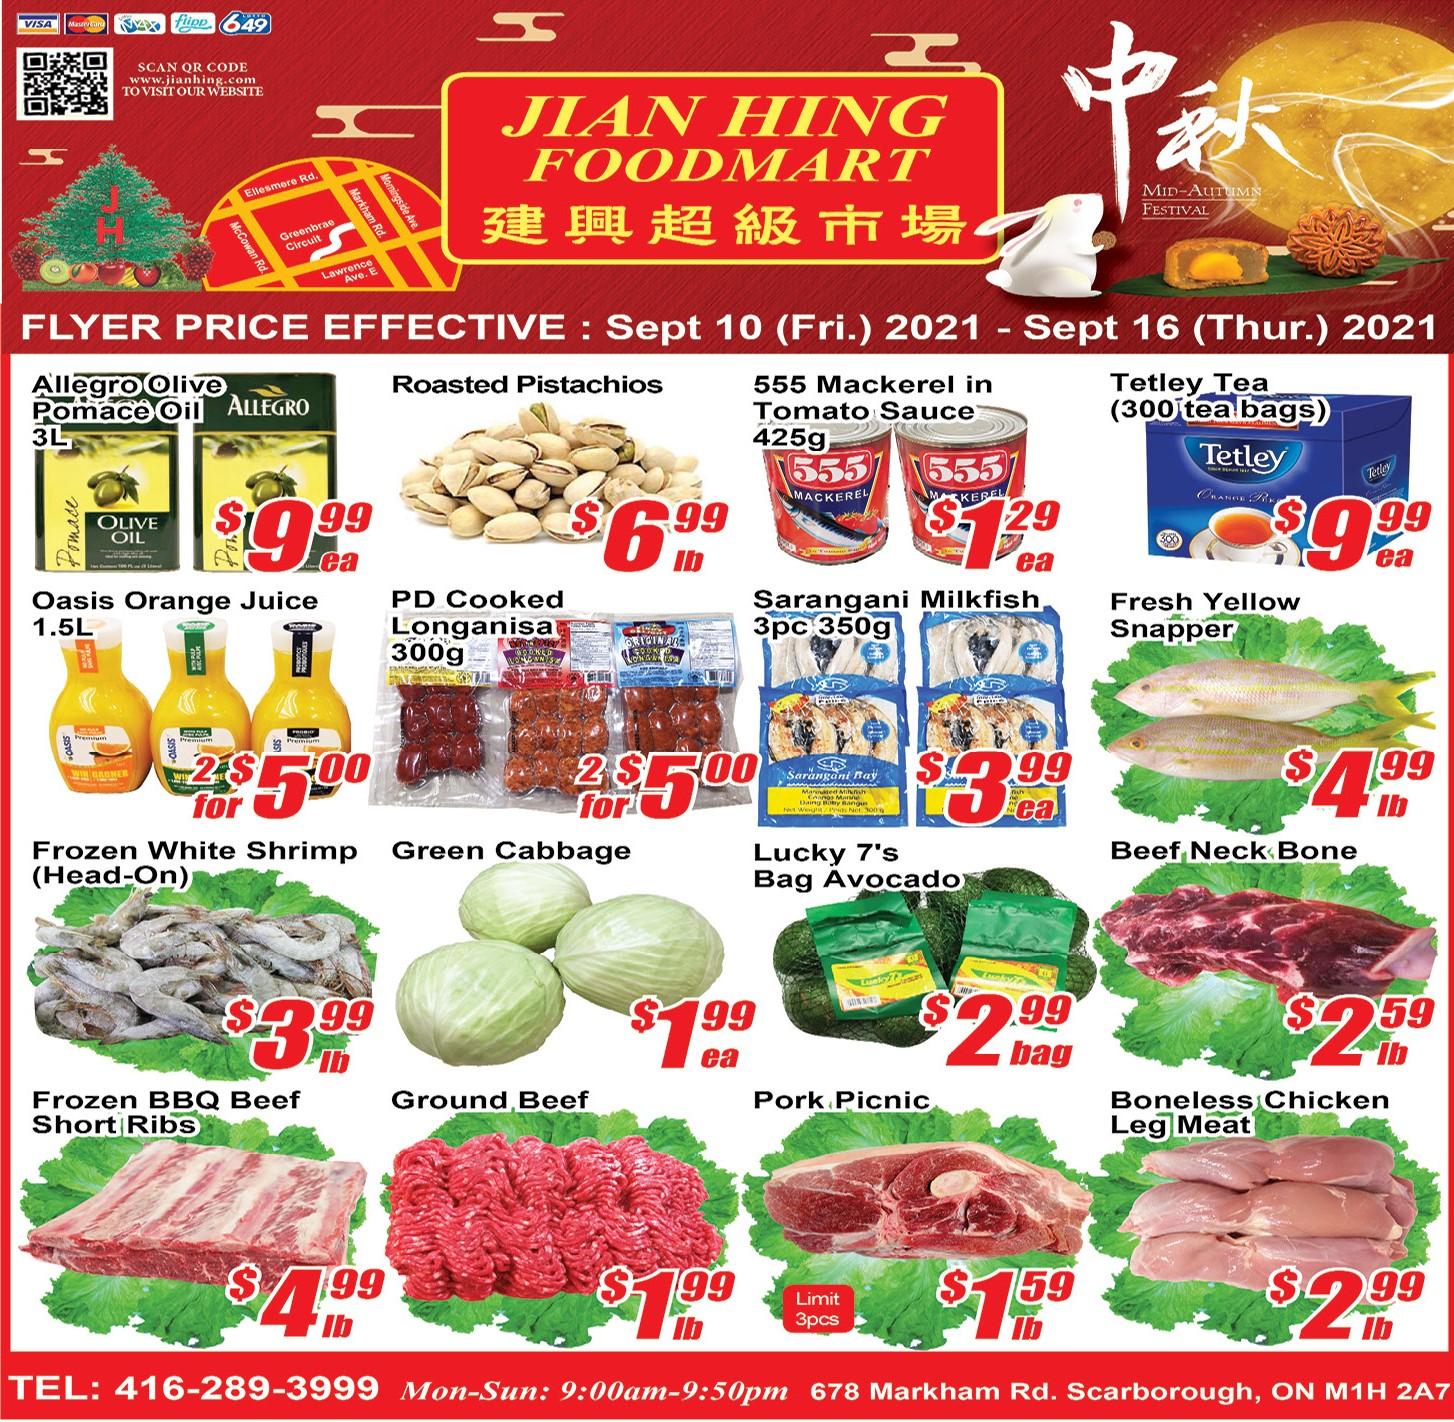 Jian Hing Foodmart Scarborough Flyer | Sep 10